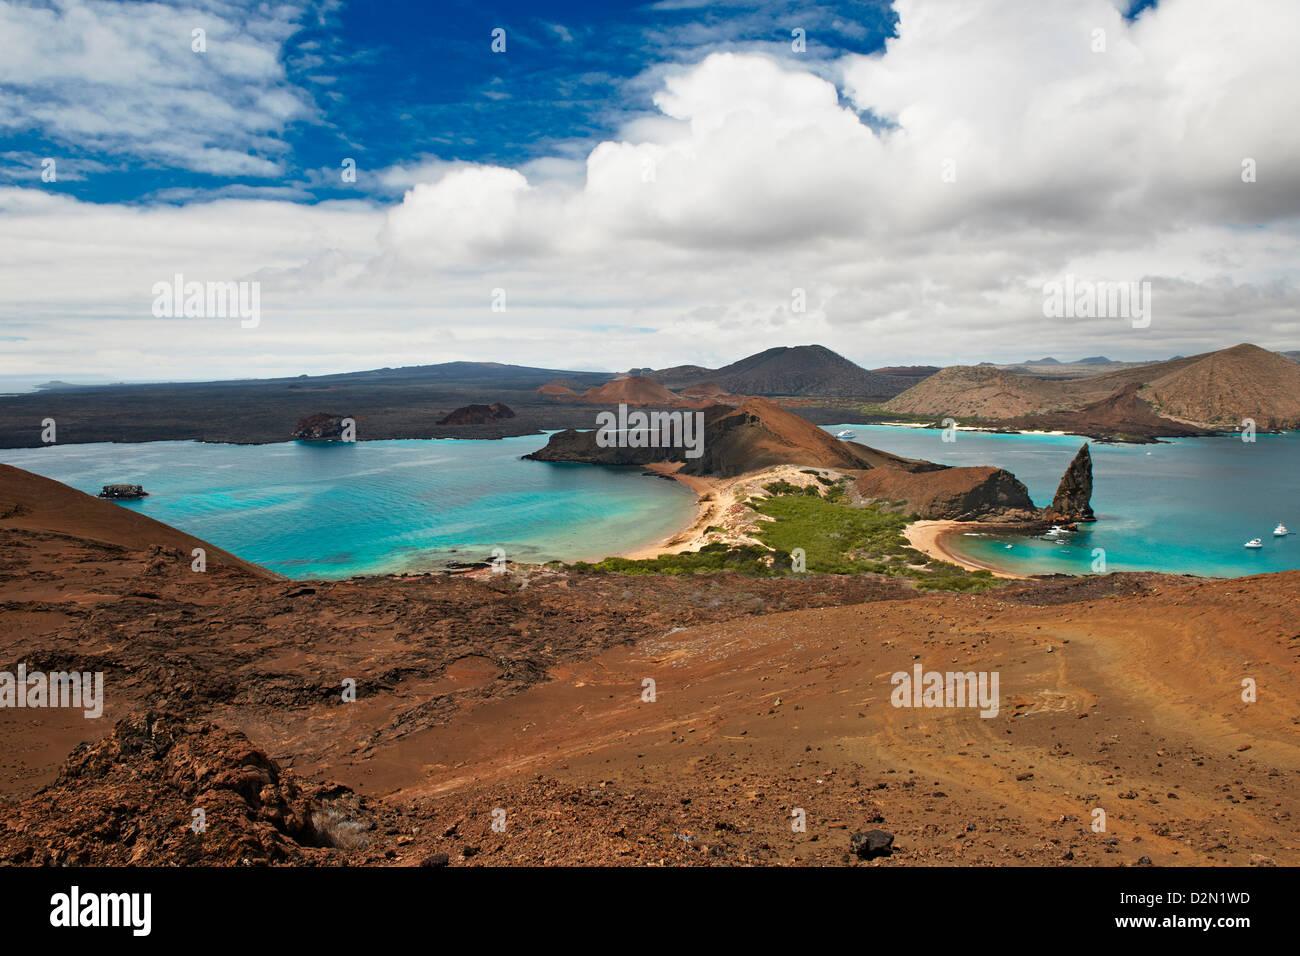 vulcanic landscape of Isla Bartolome, Galapagos Islands, Ecuador - Stock Image